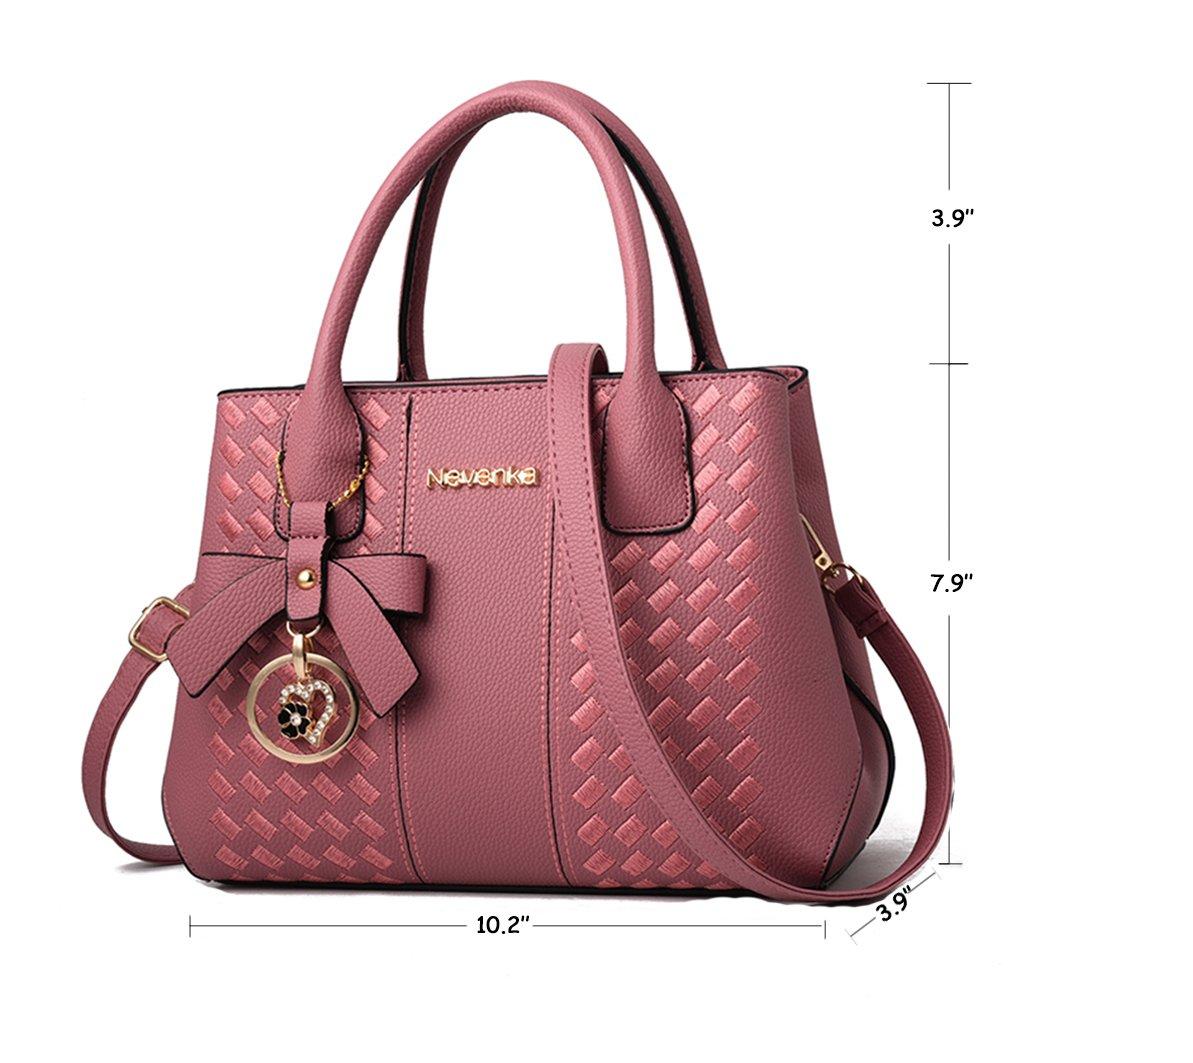 Handbags for Women Fashion Ladies Purses PU Leather Satchel Shoulder Tote Bags by Jeniulet (Image #5)